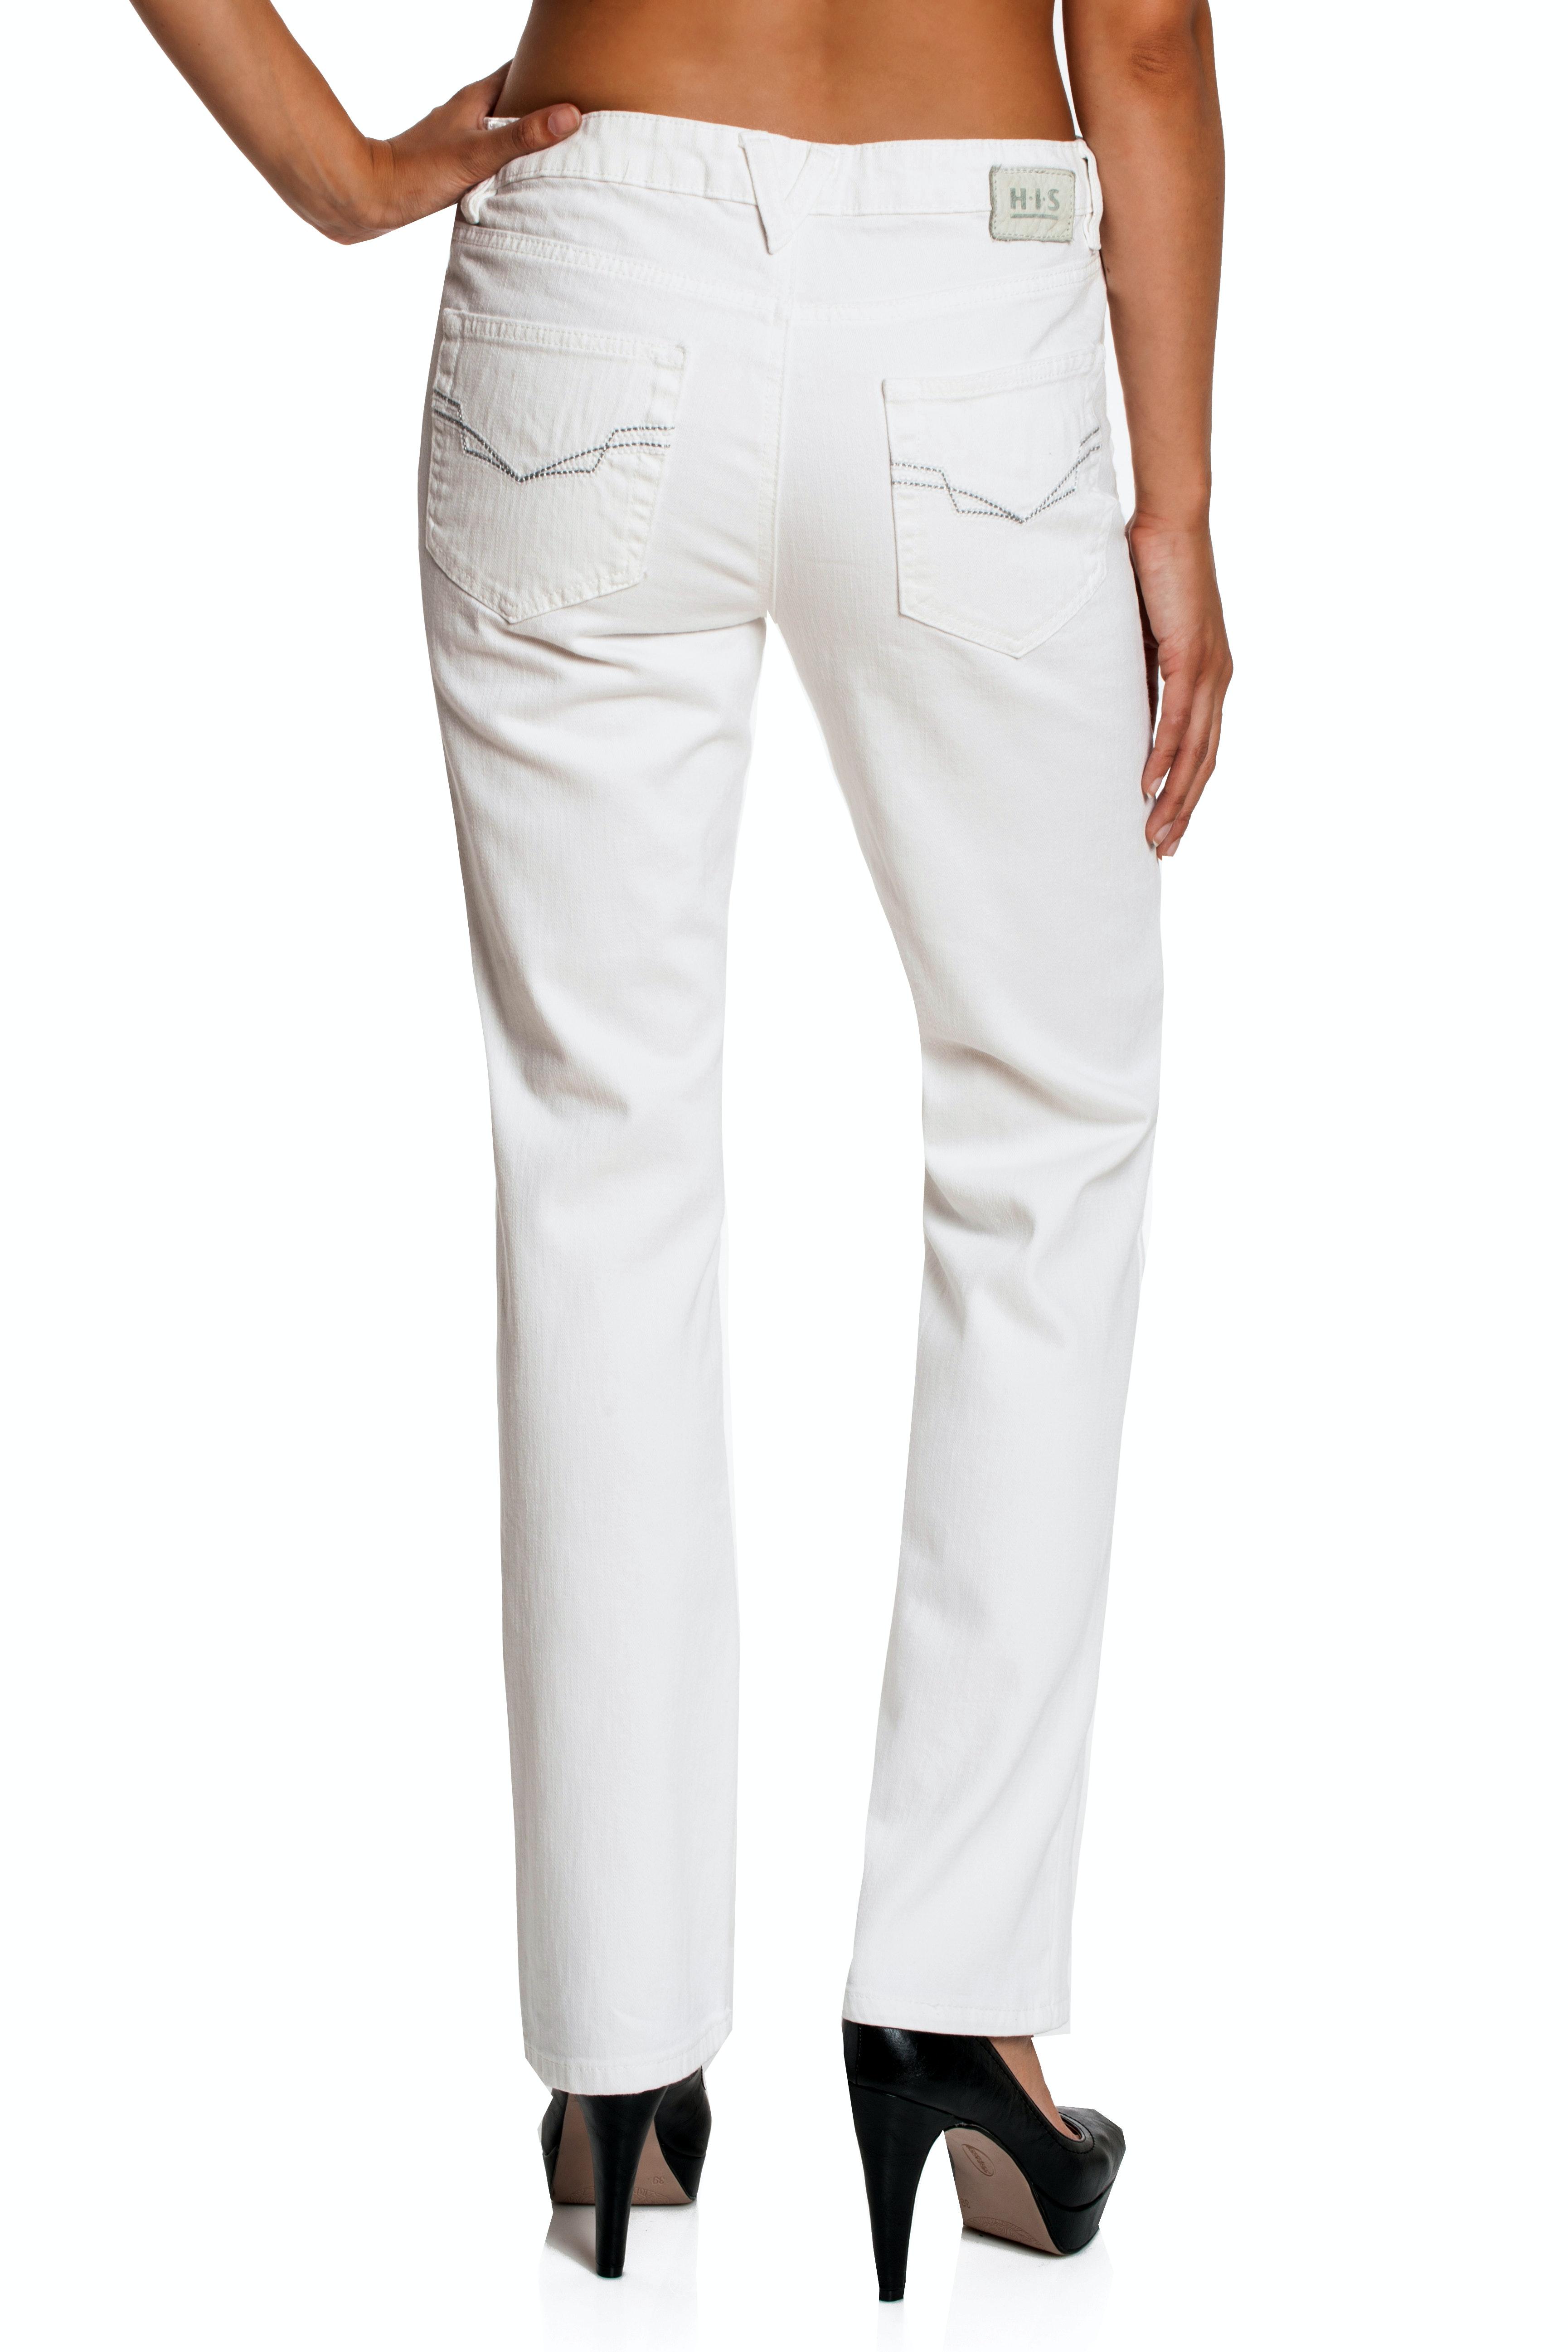 H.I.S. Jeans Mara